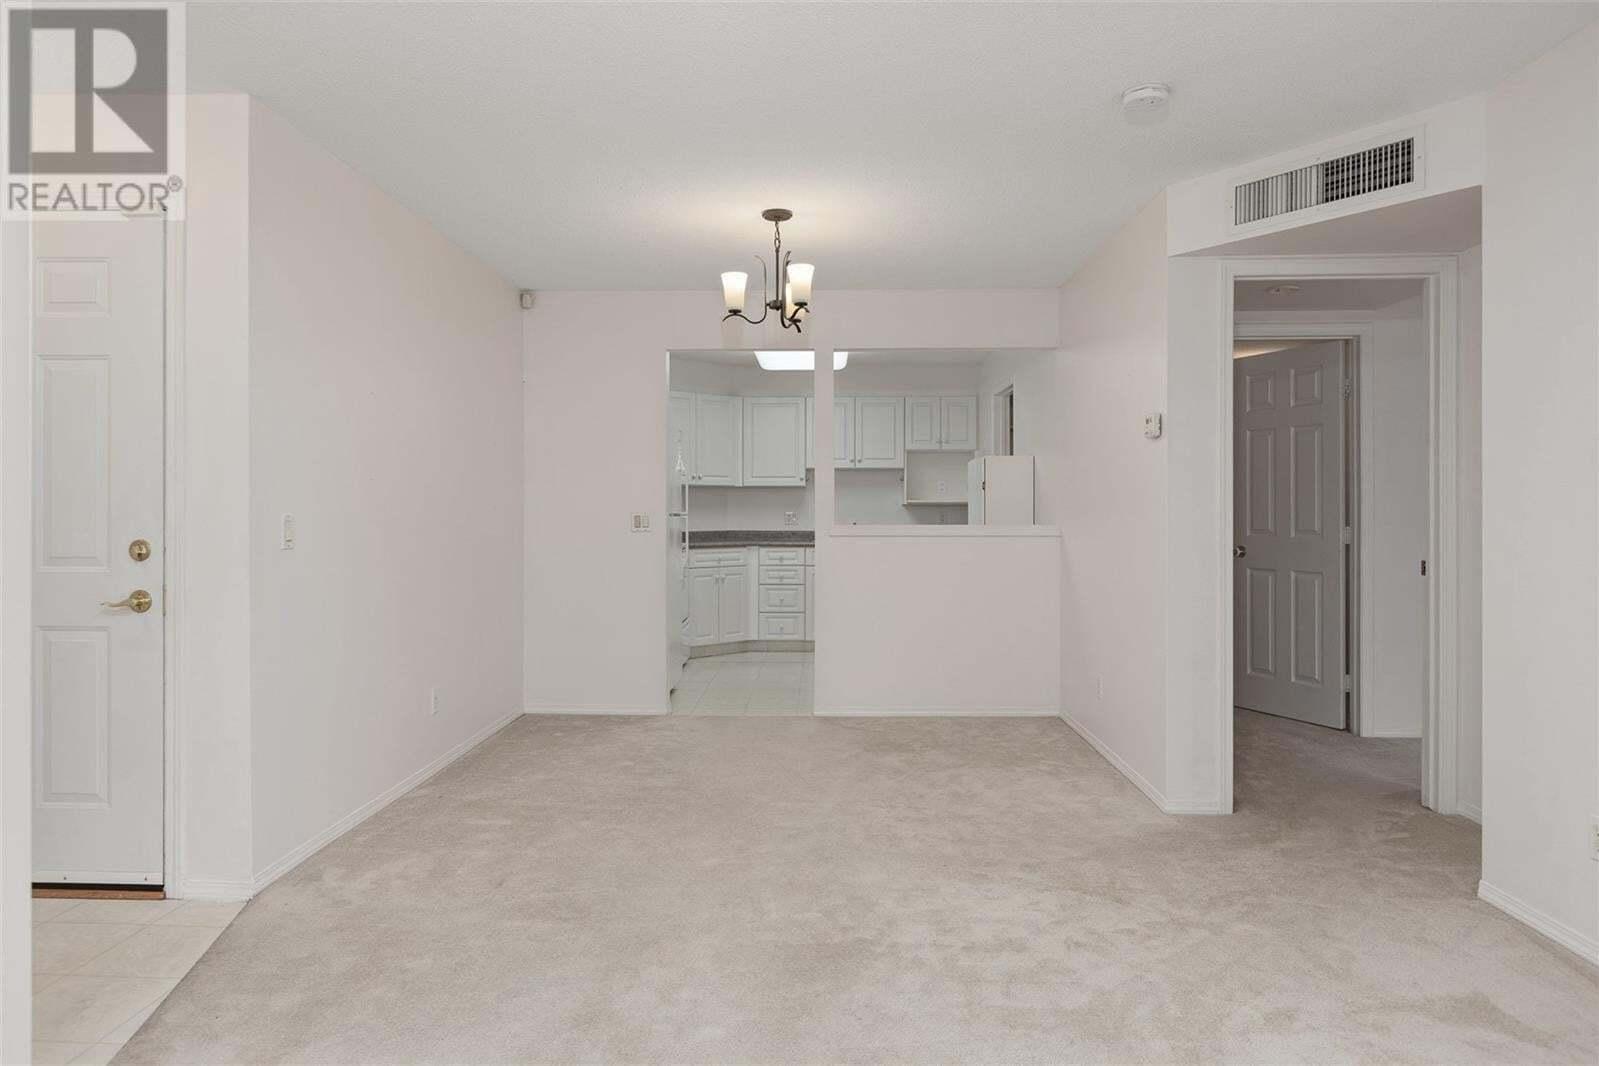 Condo for sale at 435 Main St Unit 207 Saskatoon Saskatchewan - MLS: SK830928